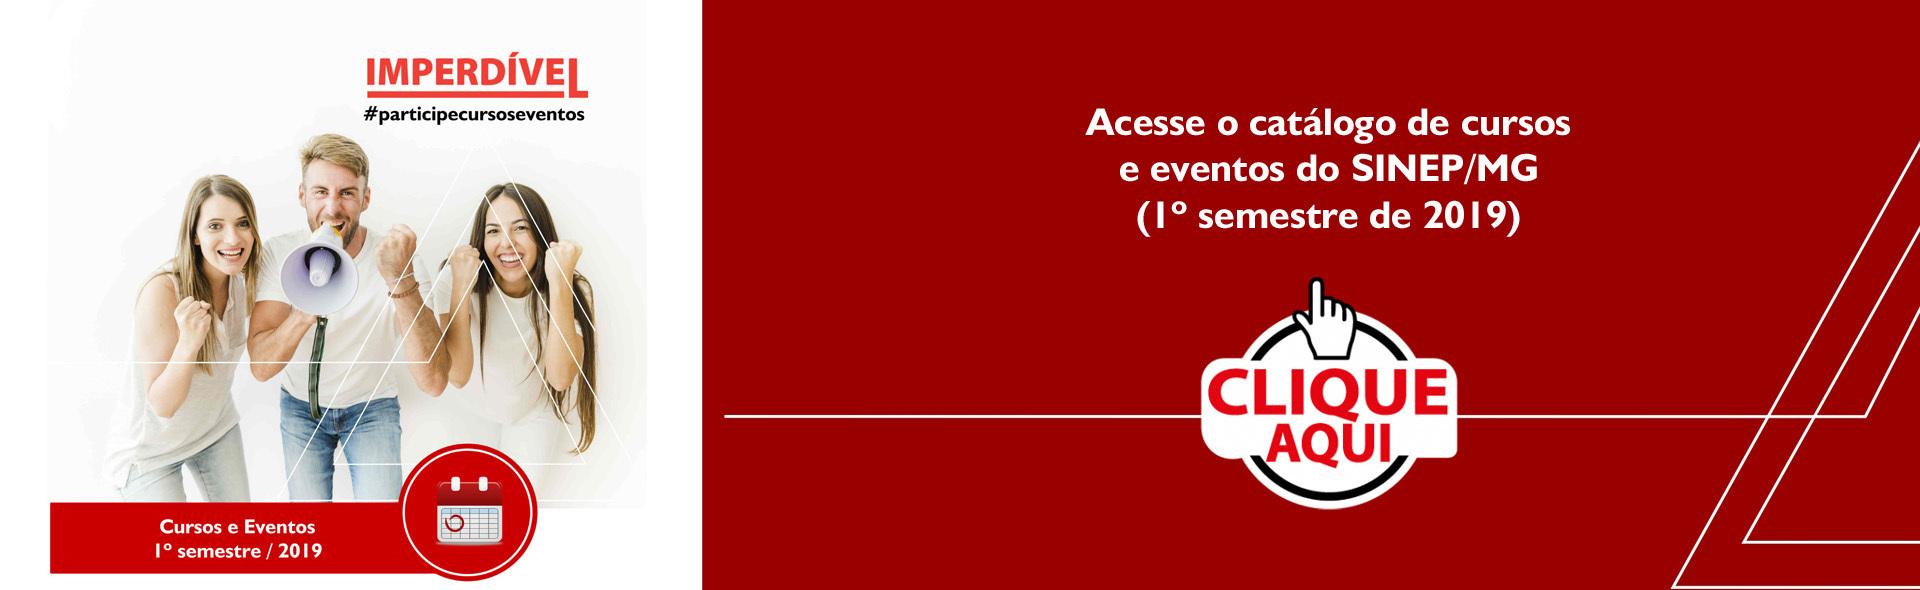 destaque/plusfiles/catalogo-cursos-2019-1-semestre.jpg